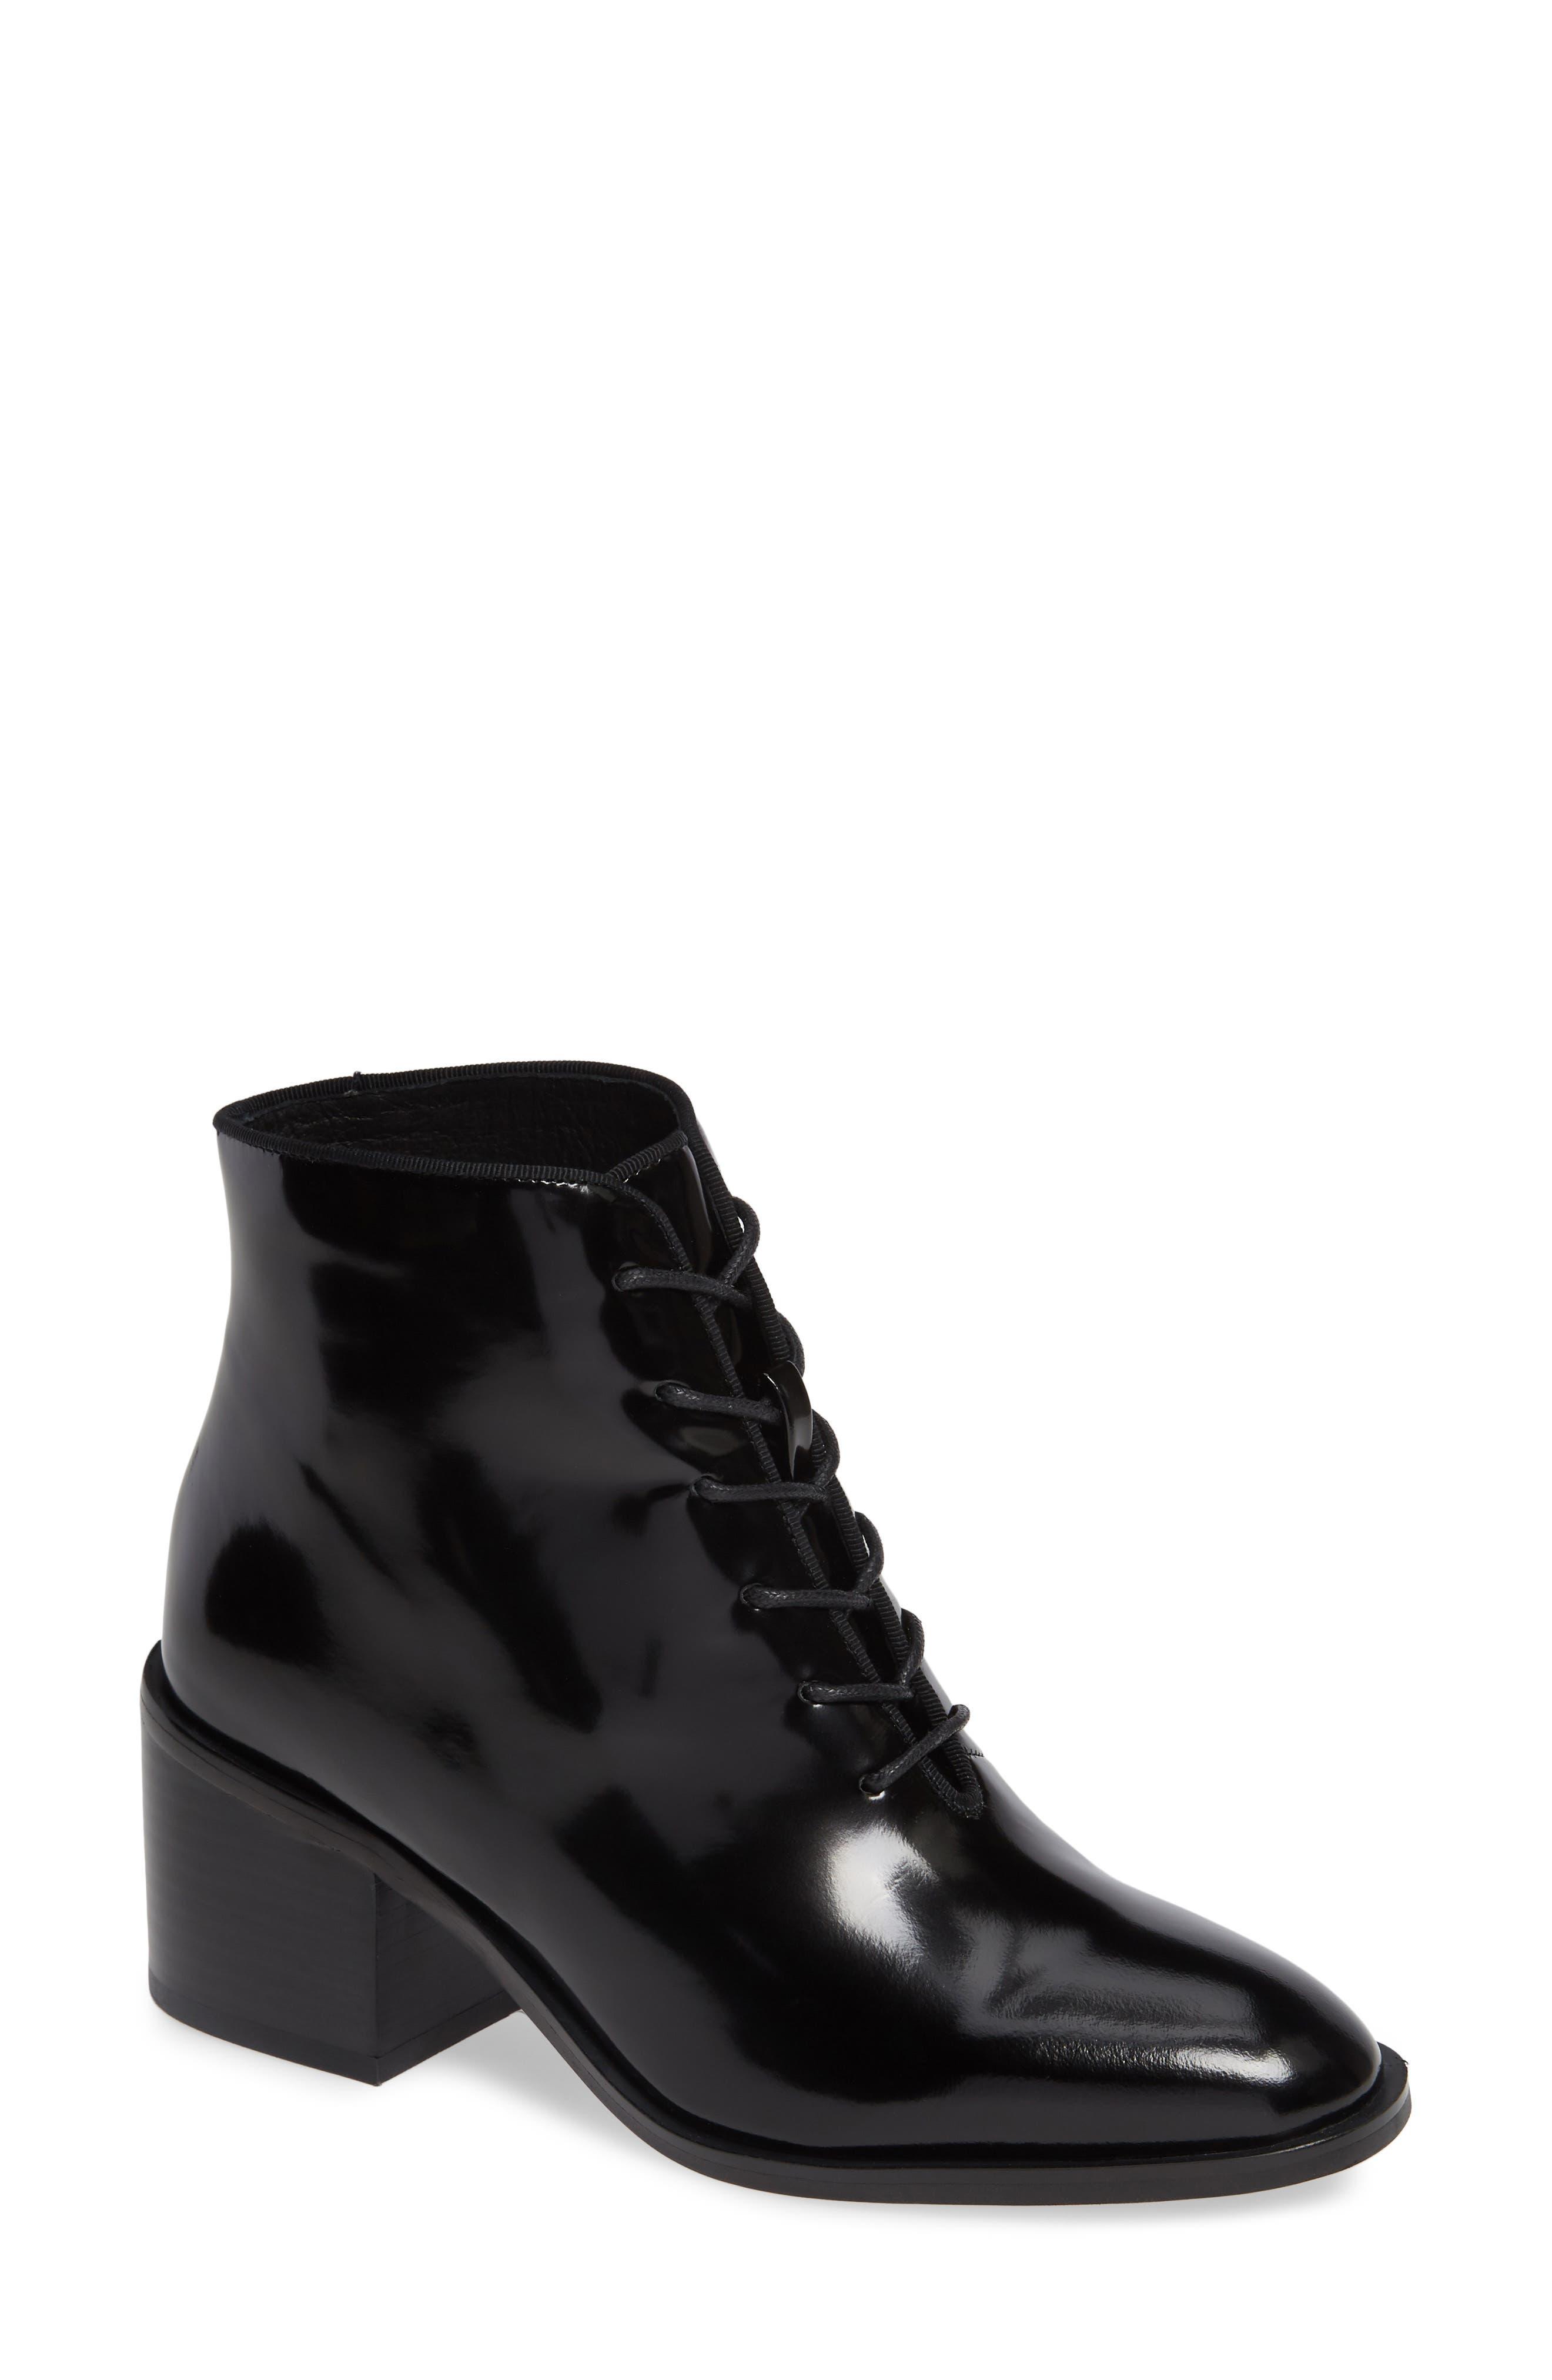 JEFFREY CAMPBELL Talcott Block Heel Bootie, Main, color, BLACK BOX